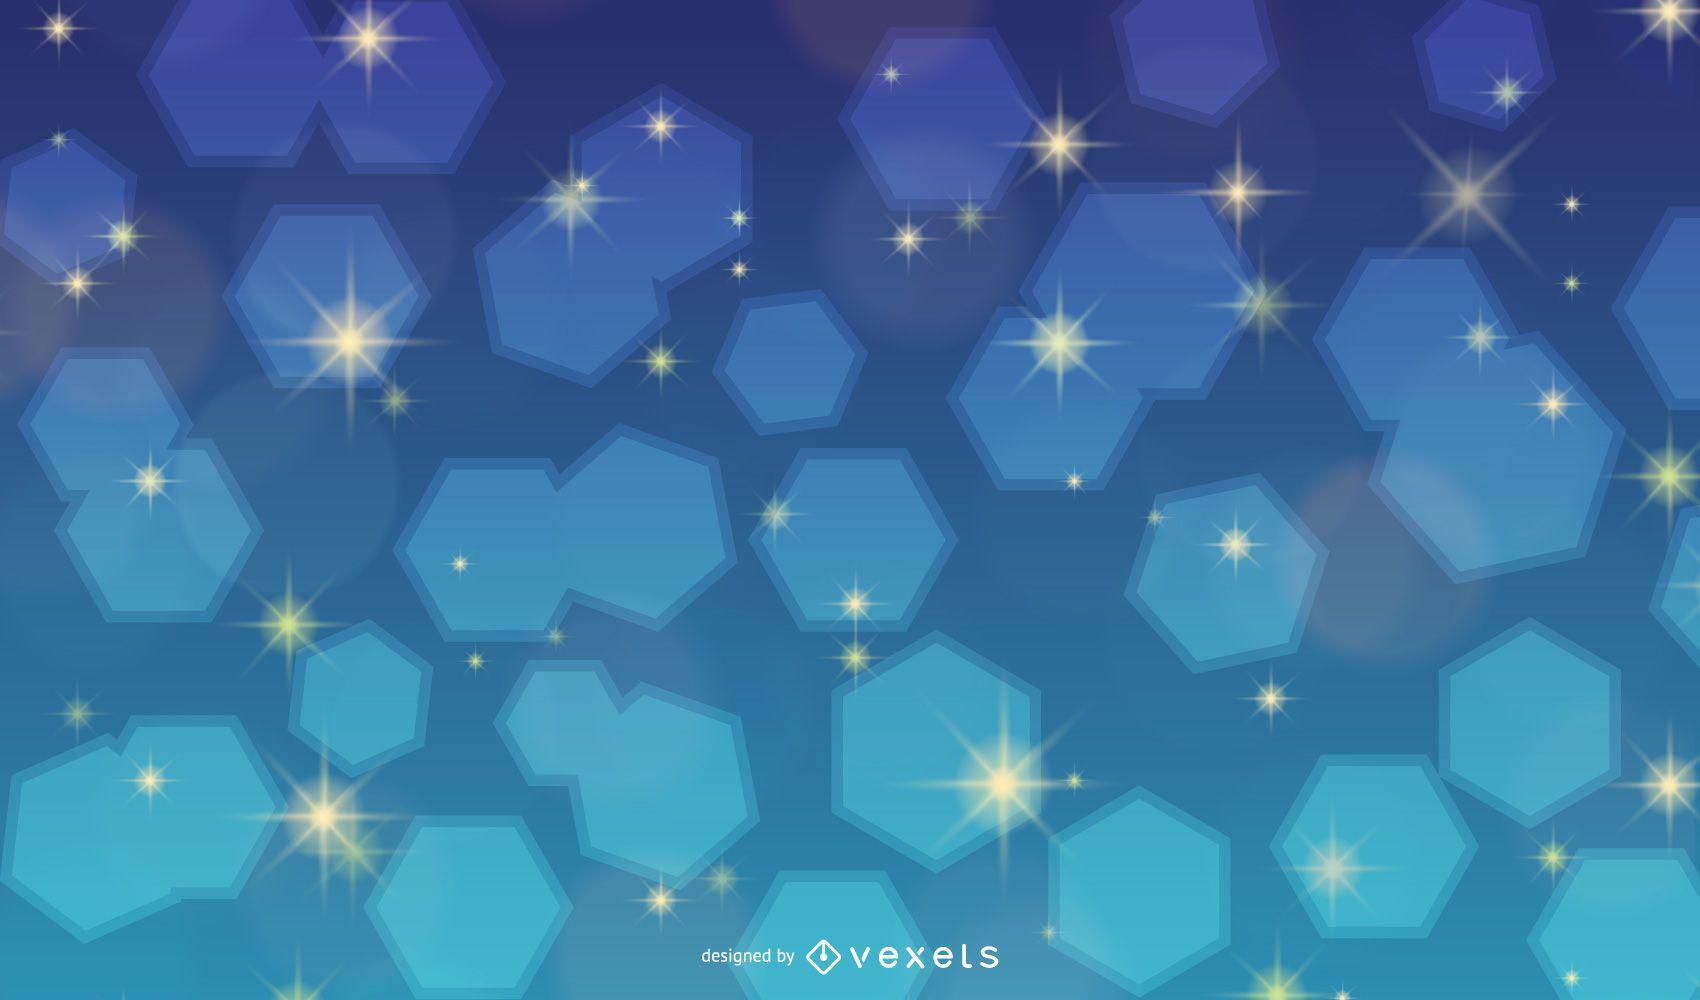 Shiny Colorful Background with Blinking Honeycomb